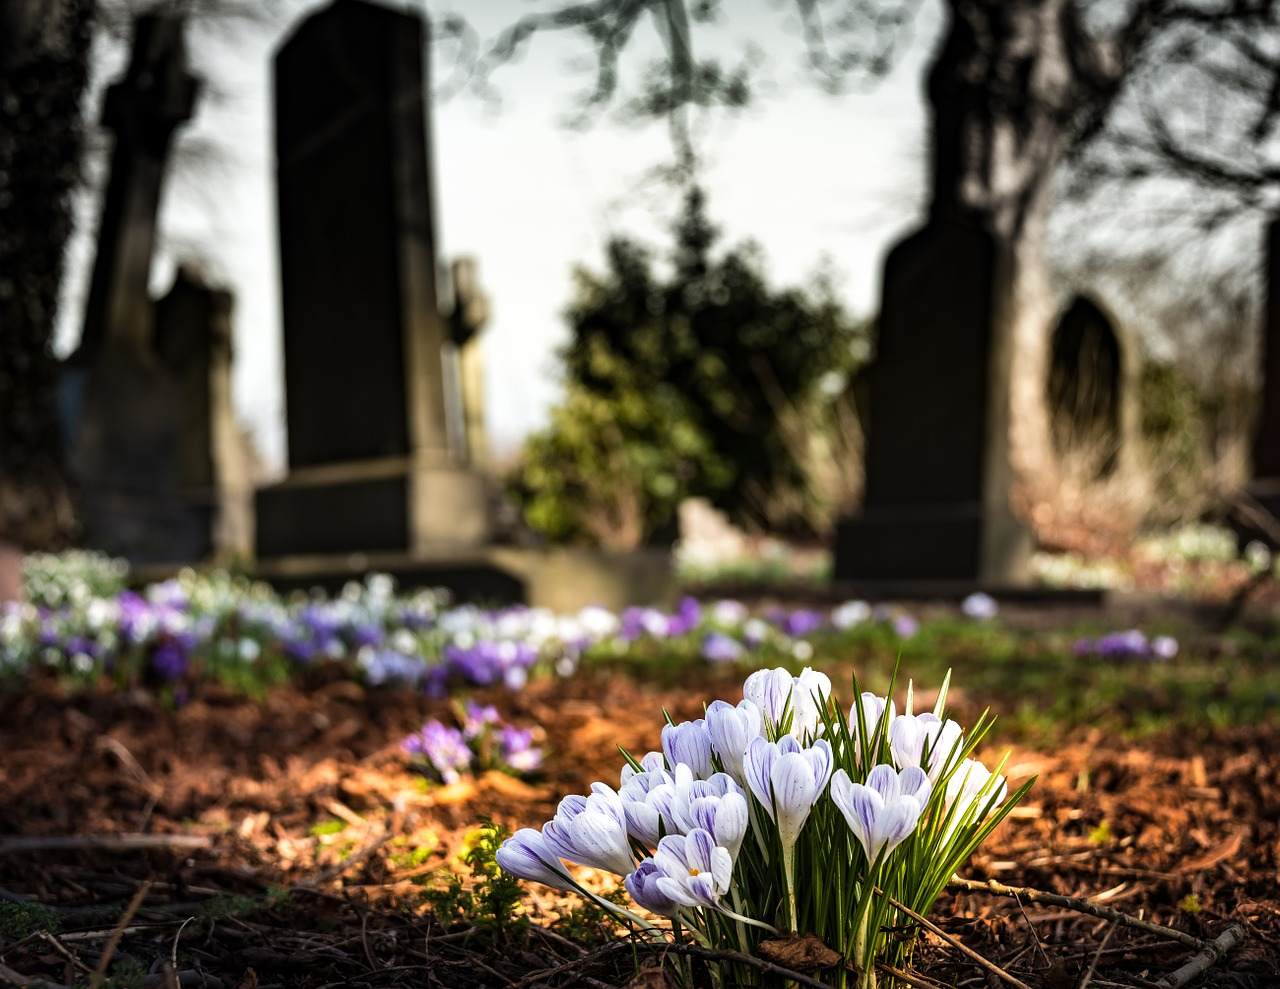 graveyard-1417871_1280.jpg